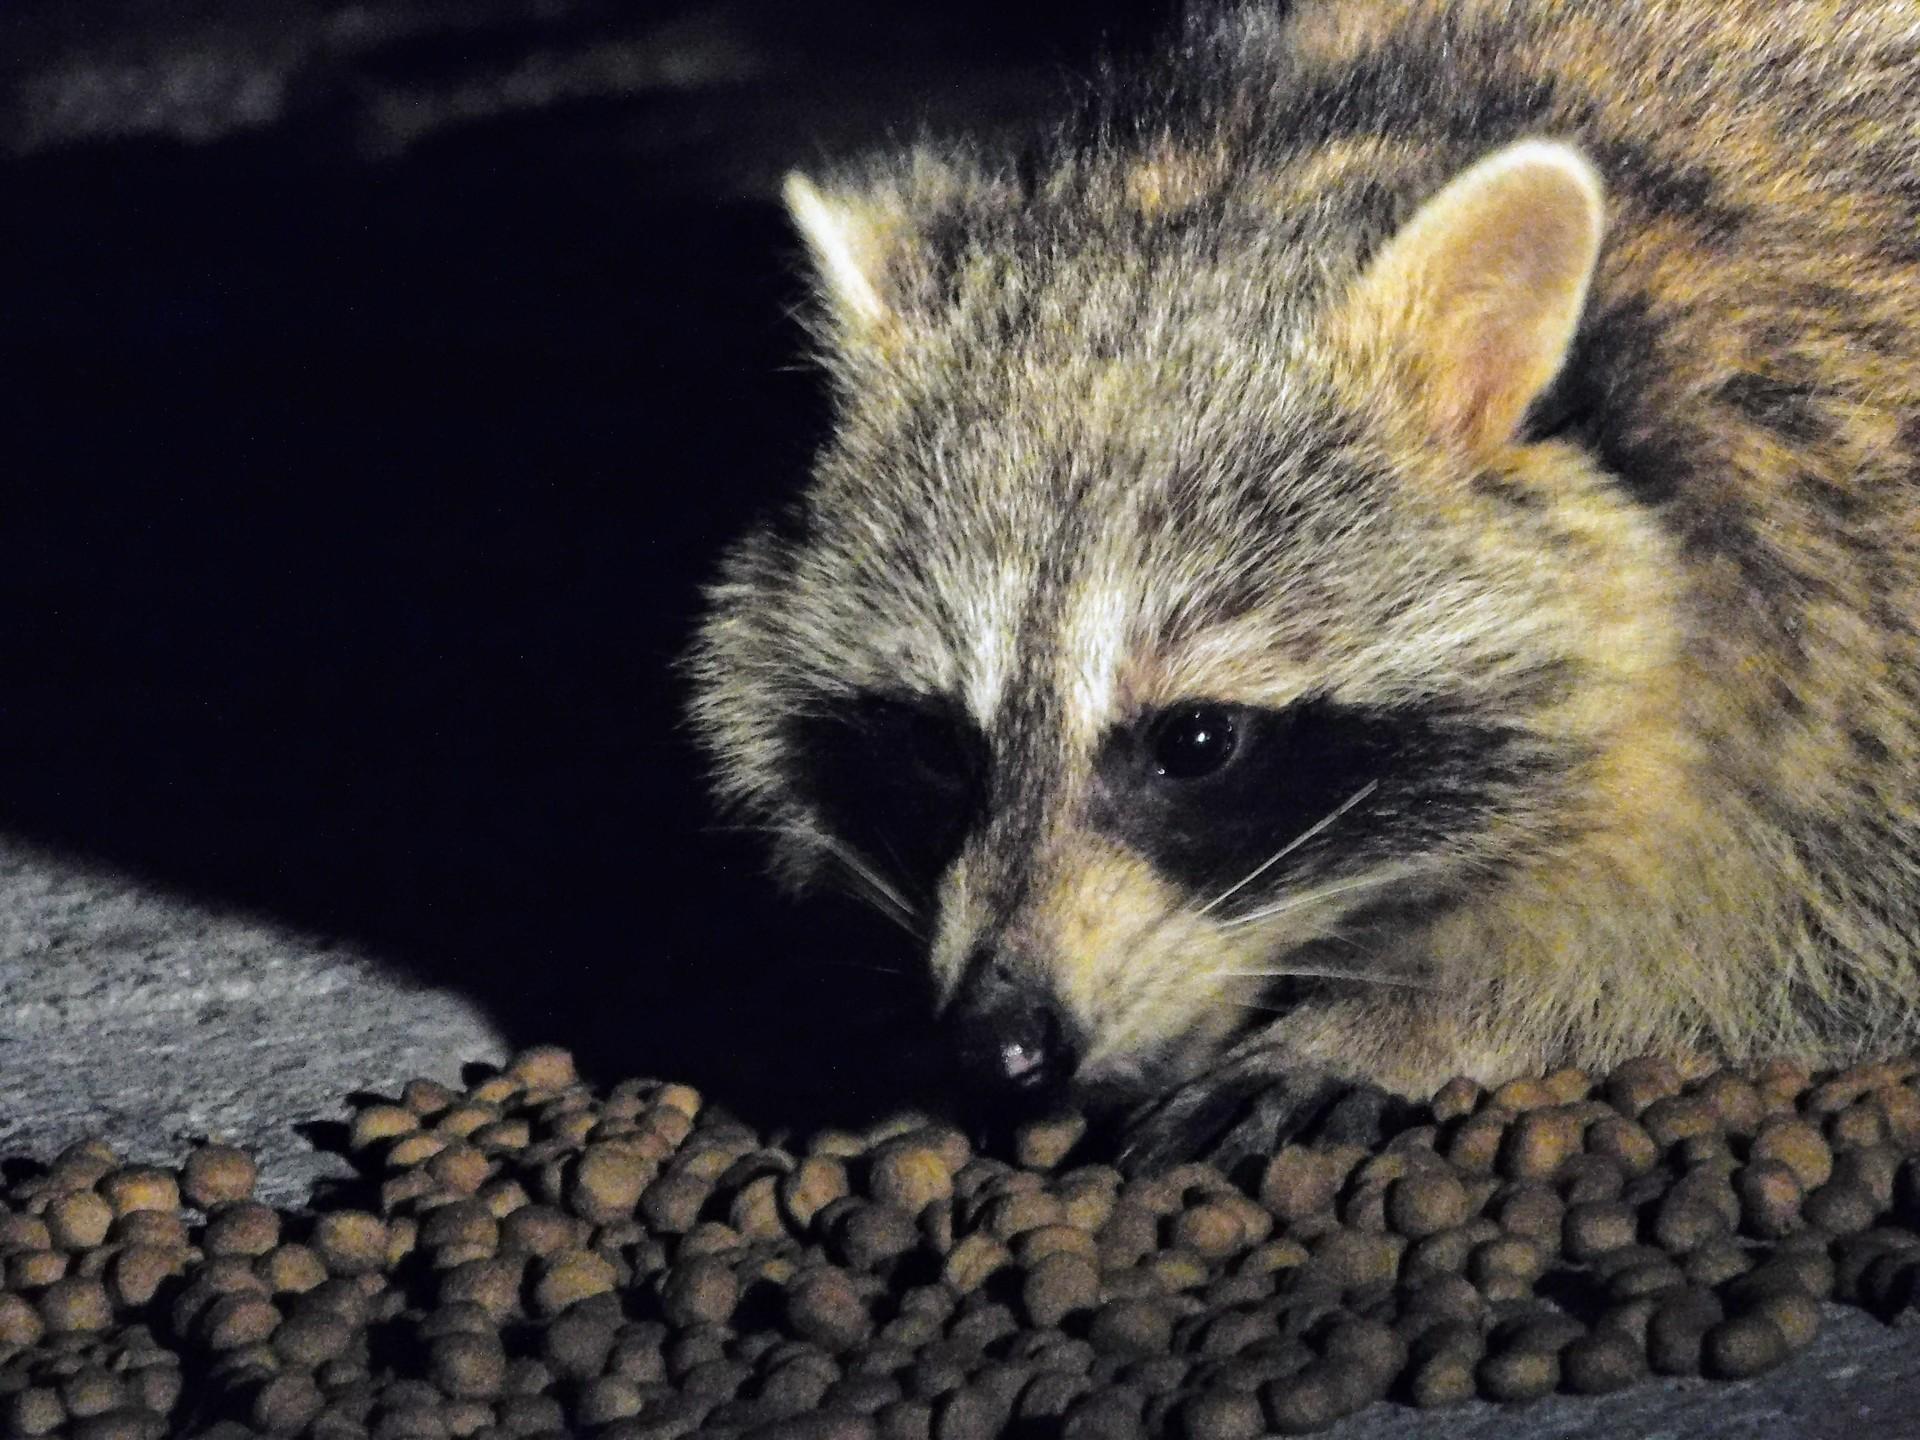 Racoon | rick.cognyl.fournier, animal, cute, eye